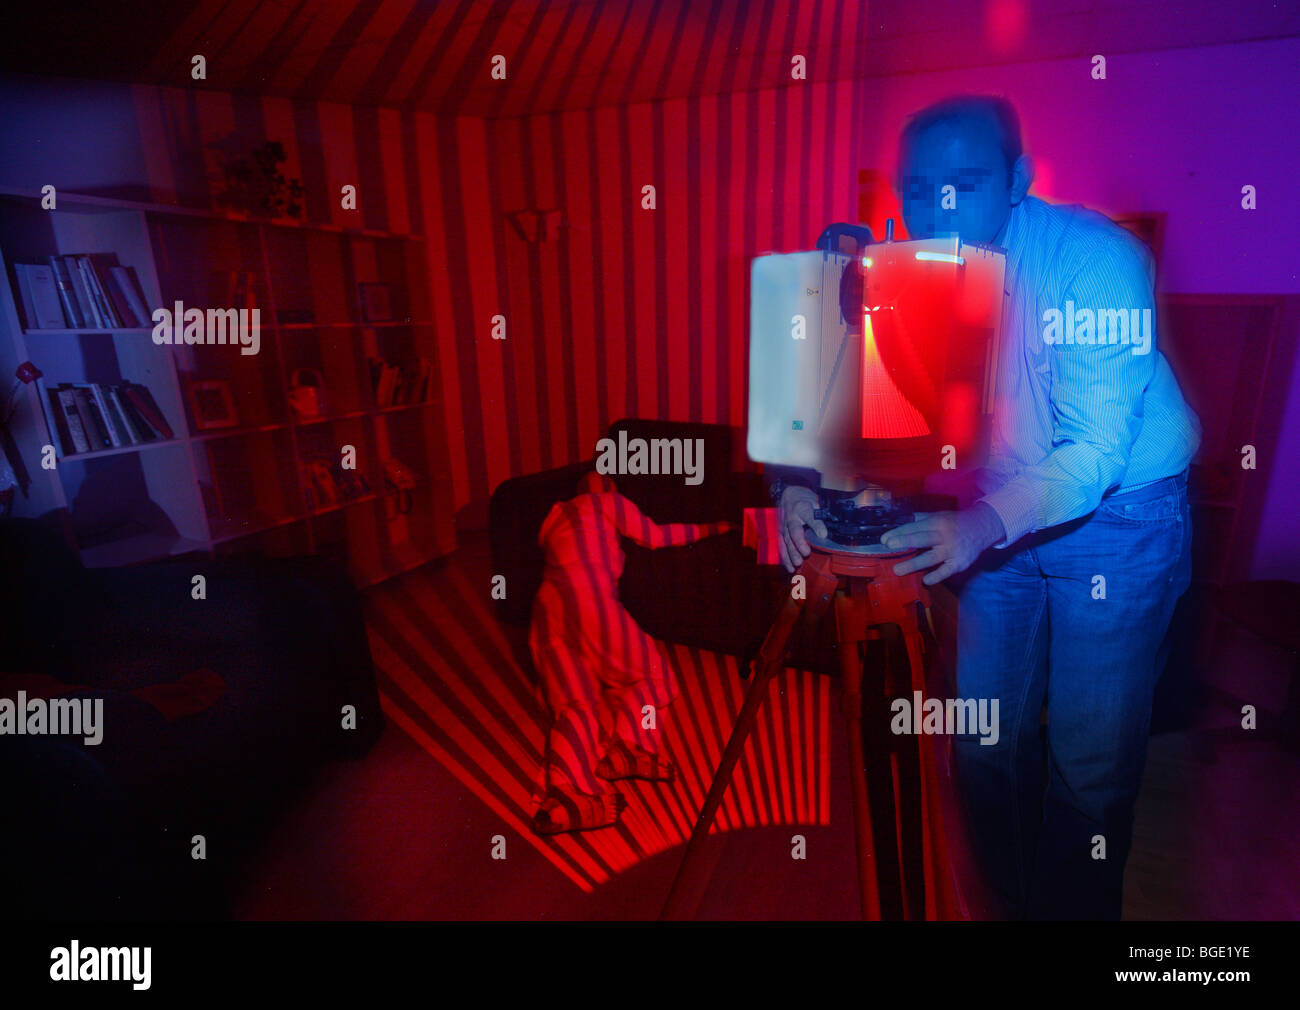 criminal investigation department, 3-D room scanner to reconstruct a crime scene. - Stock Image